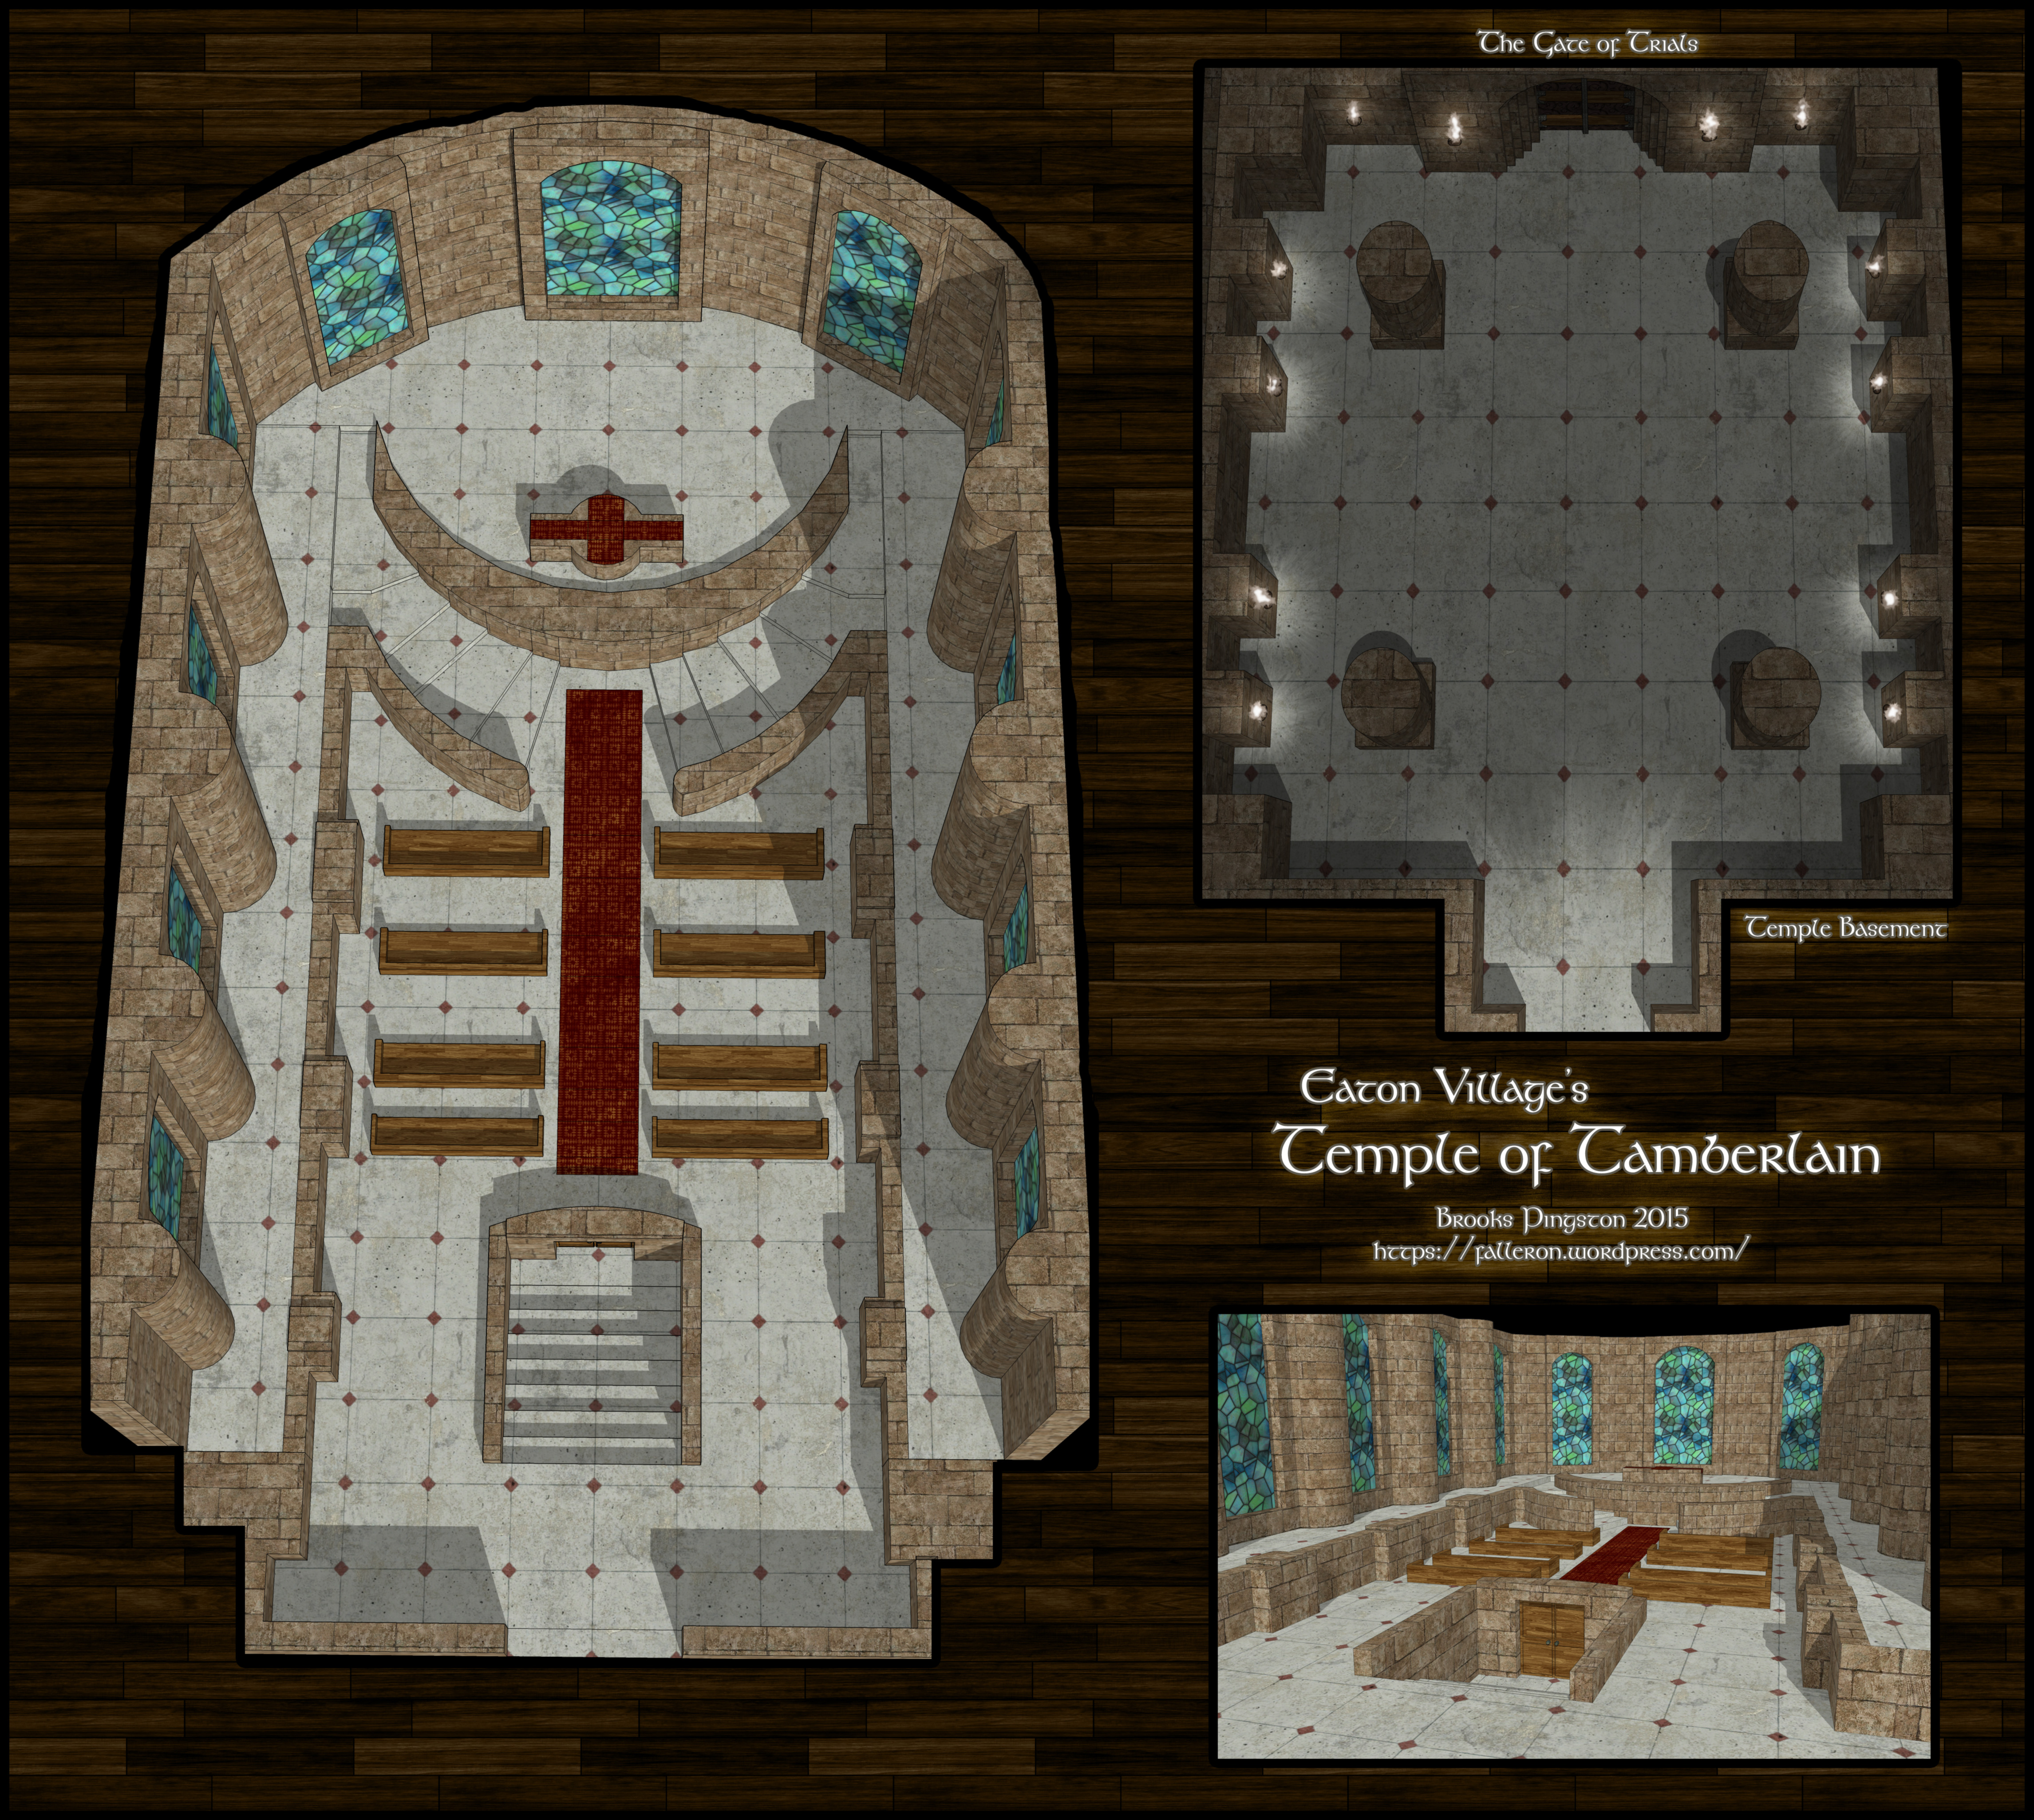 Encounter Map x2 Temple of Tamberlain Interior Falleron